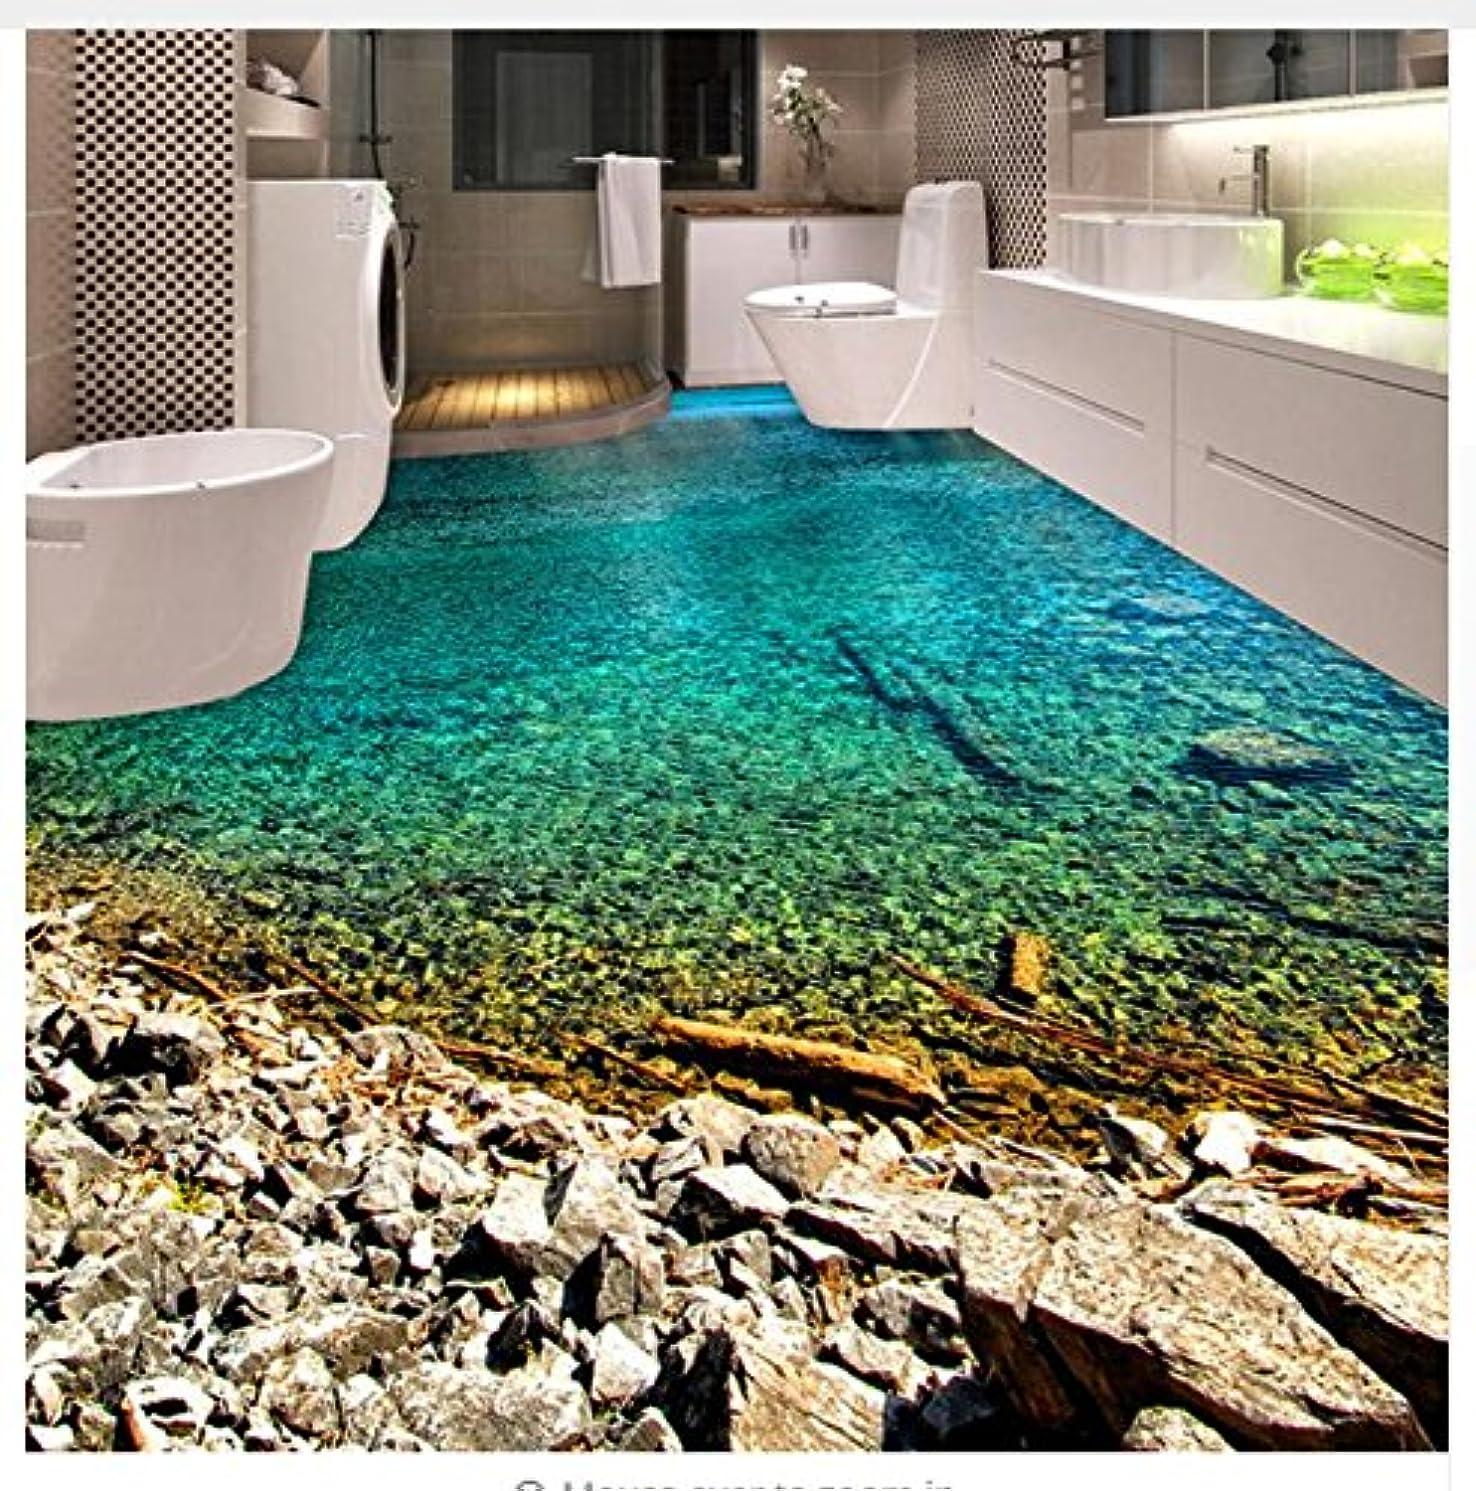 3D Wallpaper Floor PVC Mural Custom Clear River Water 3D Floor Mural Wallpaper Kitchen Bathroom Wear Non-Slip Waterproof Thickened PVC Stickers 300x210cm,Ayzr